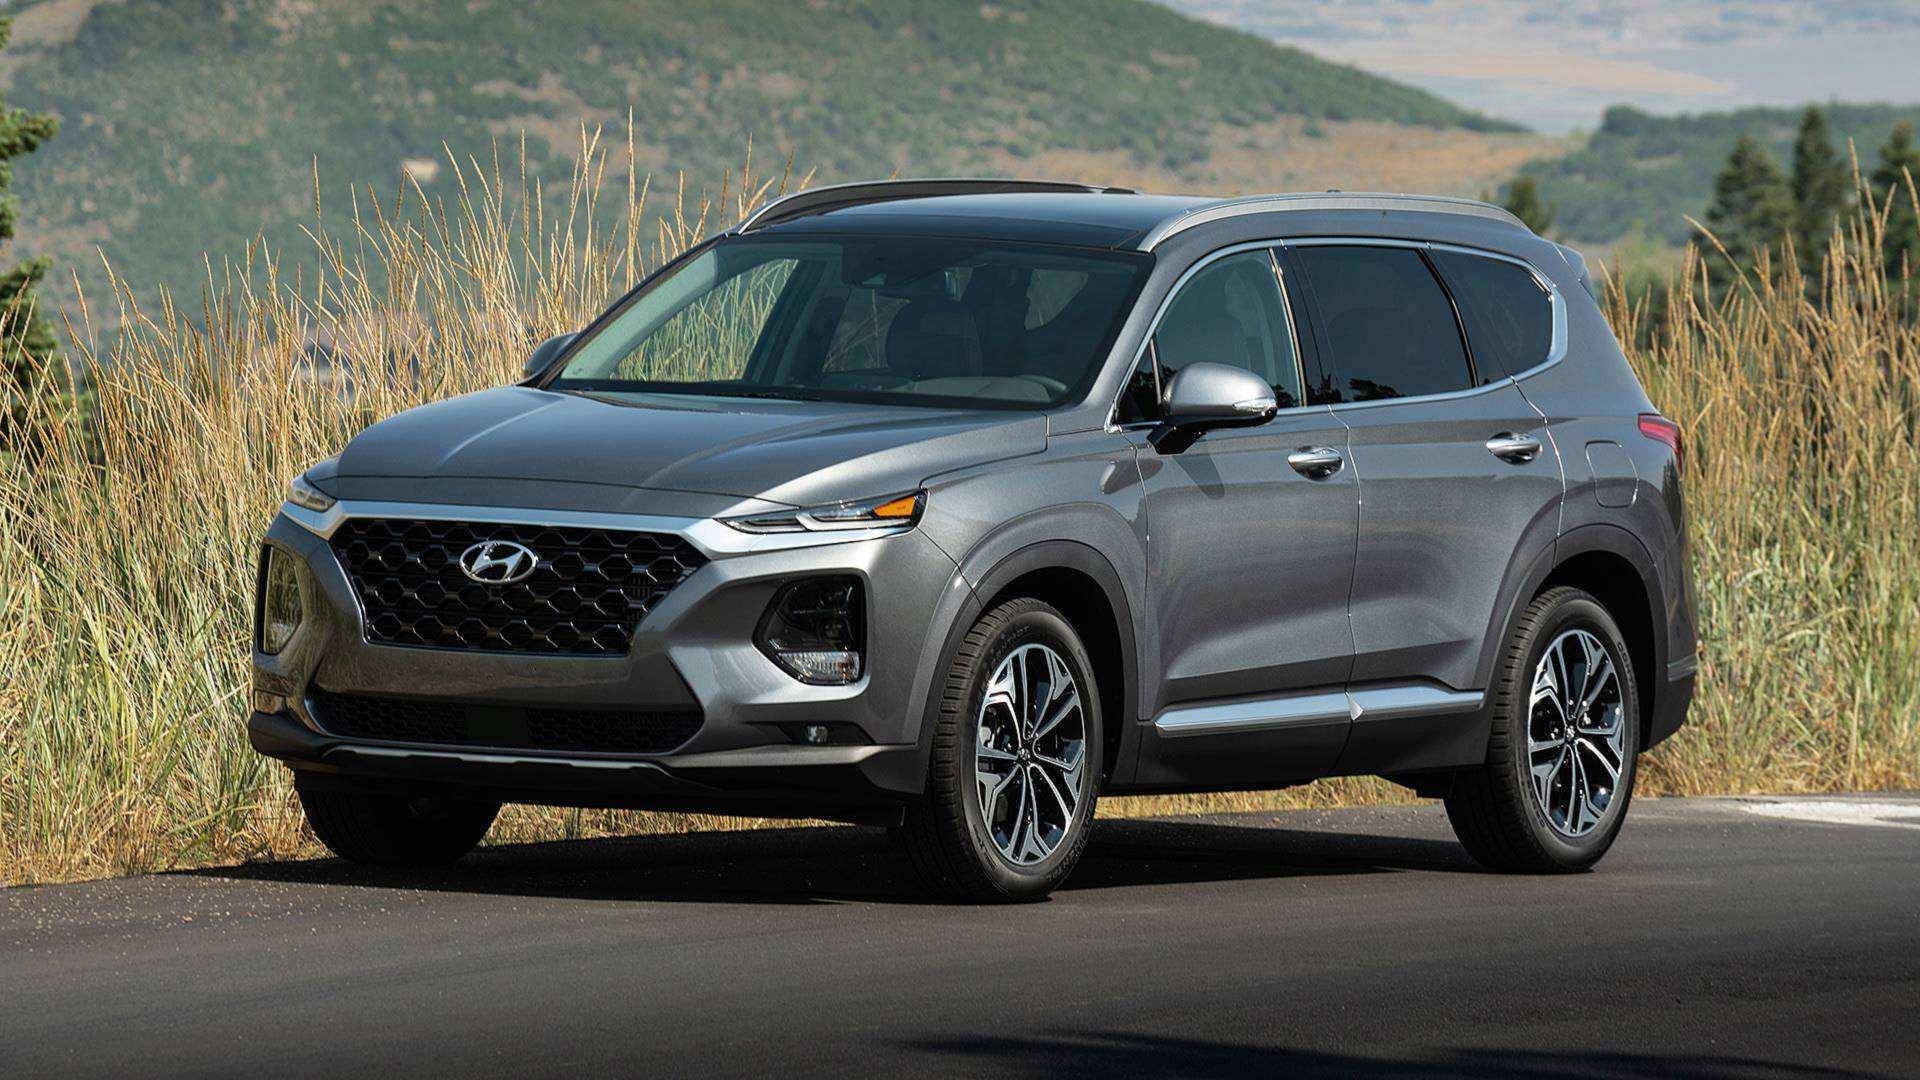 48 New 2019 Hyundai Santa Fe Test Drive Interior for 2019 Hyundai Santa Fe Test Drive